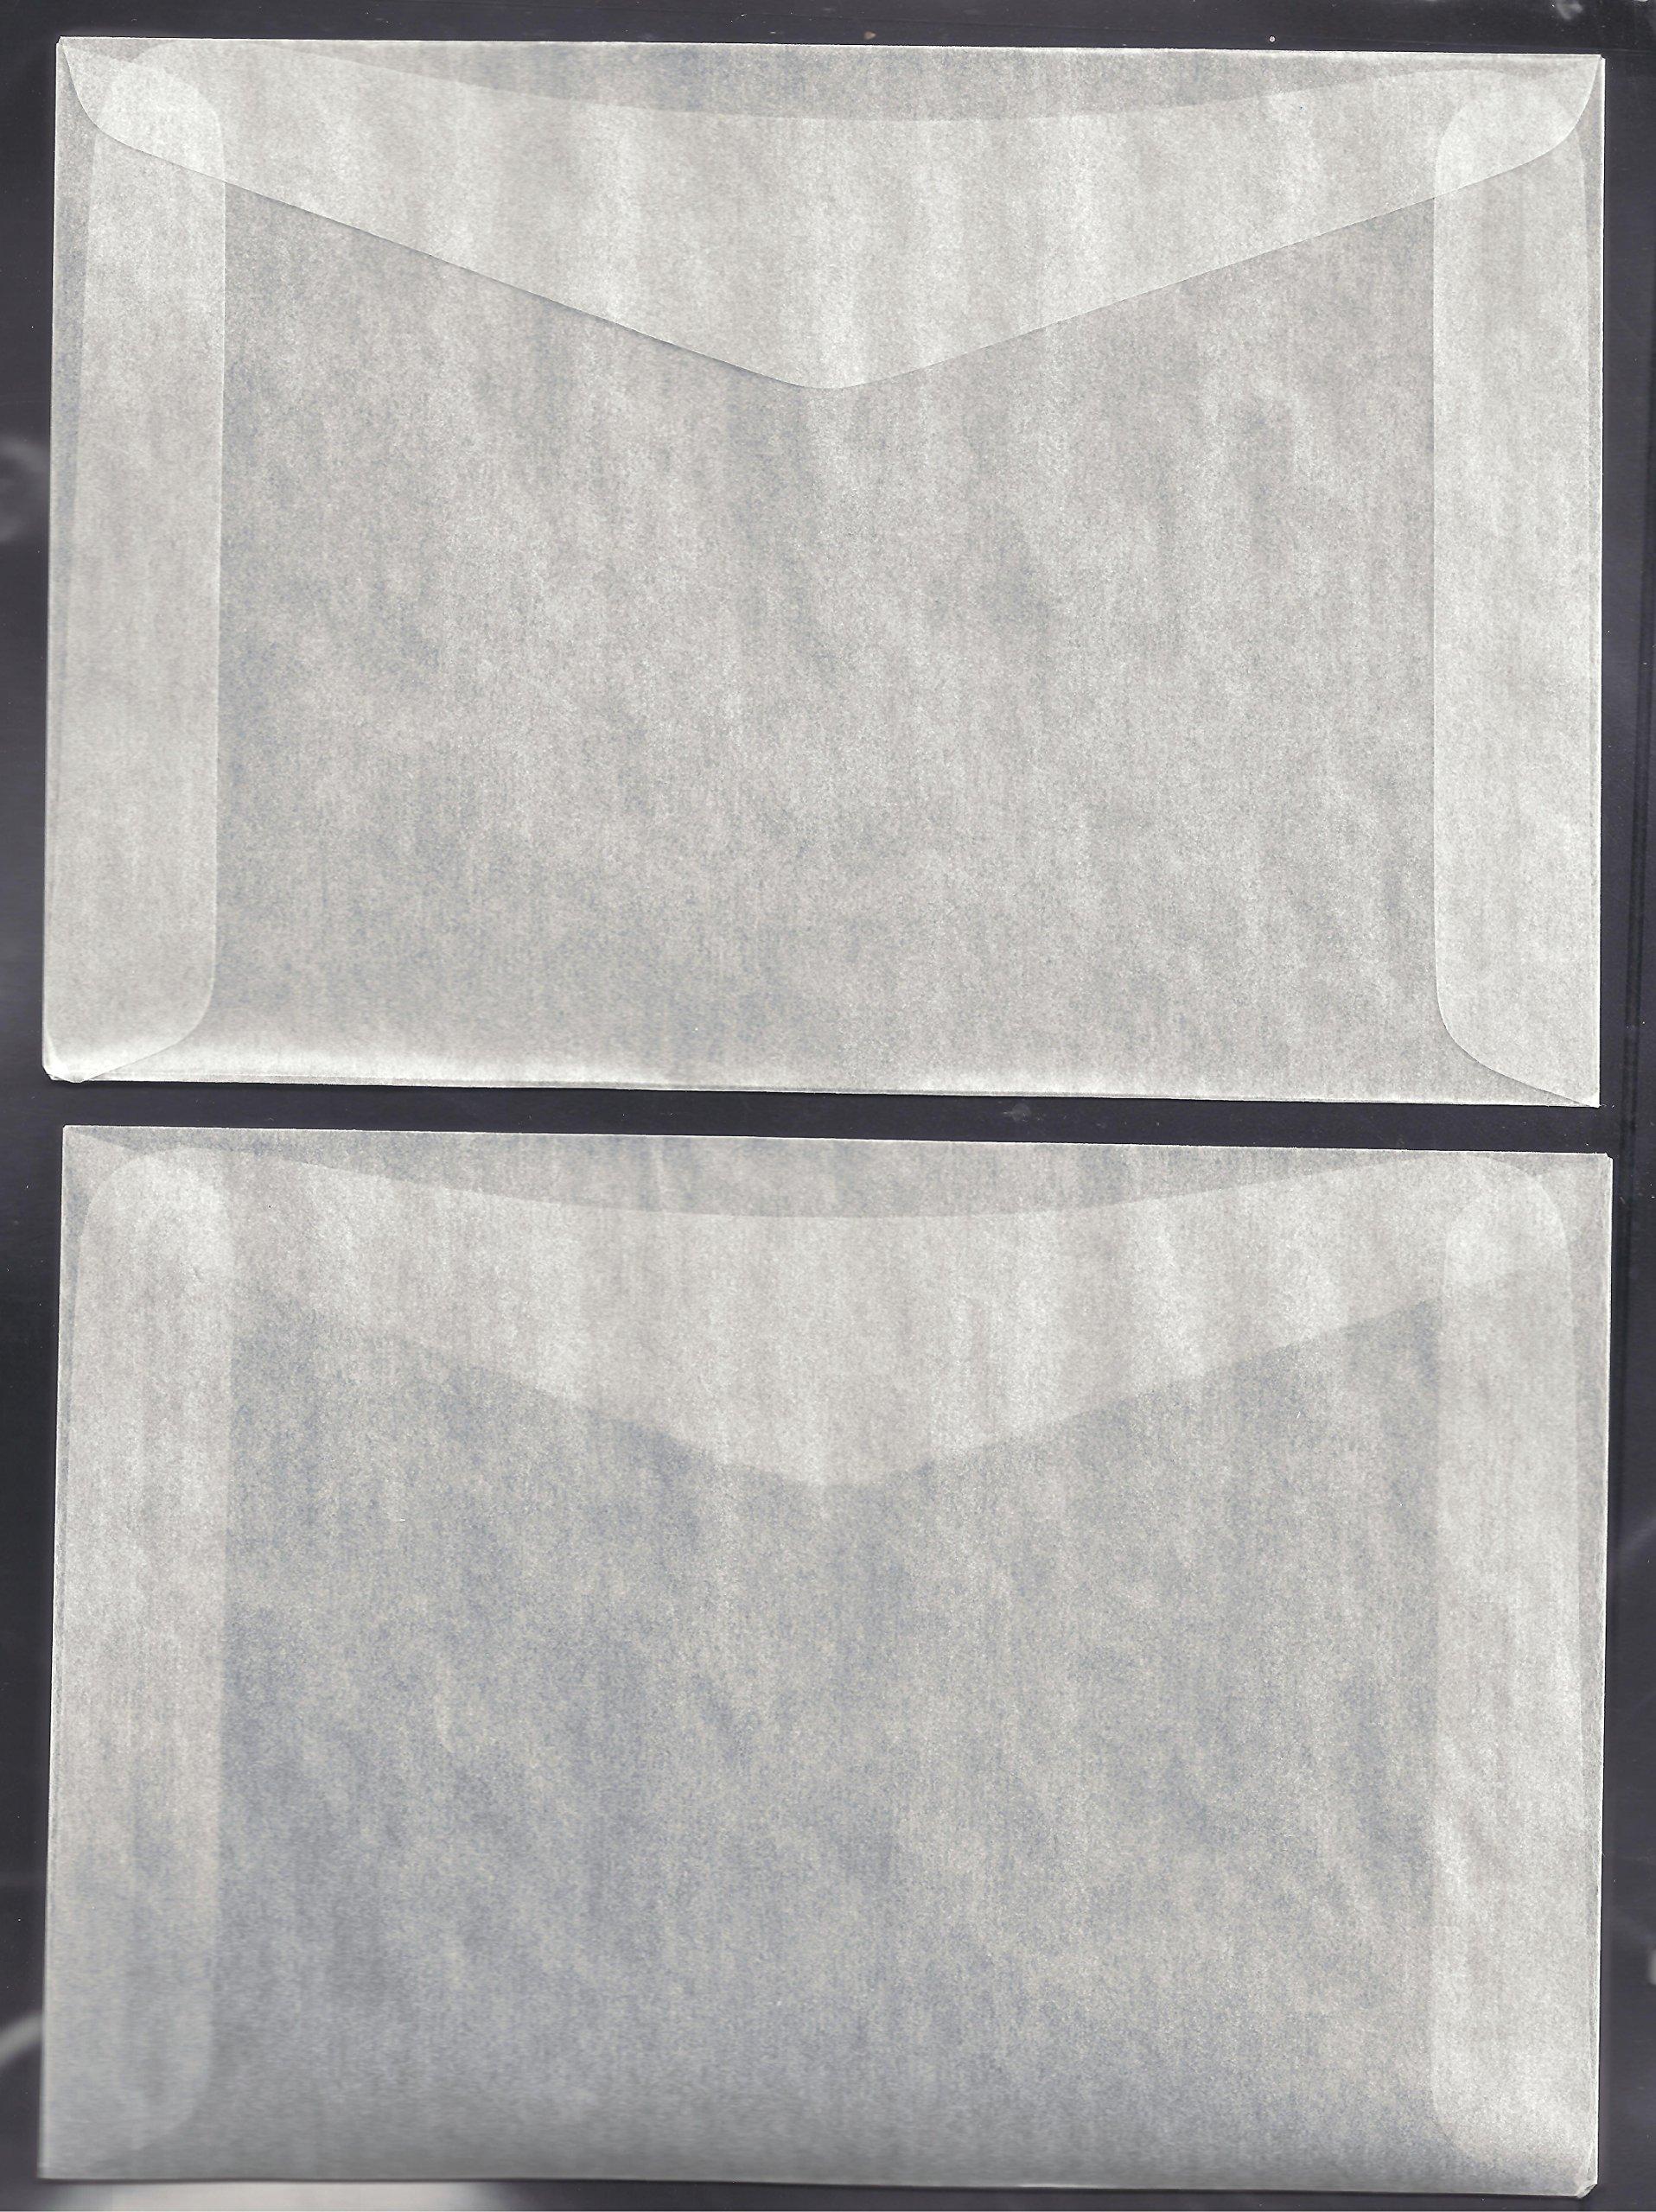 1,000 #8 Glassine Envelopes -- 4 1/2 X 6 5/8 INCHES